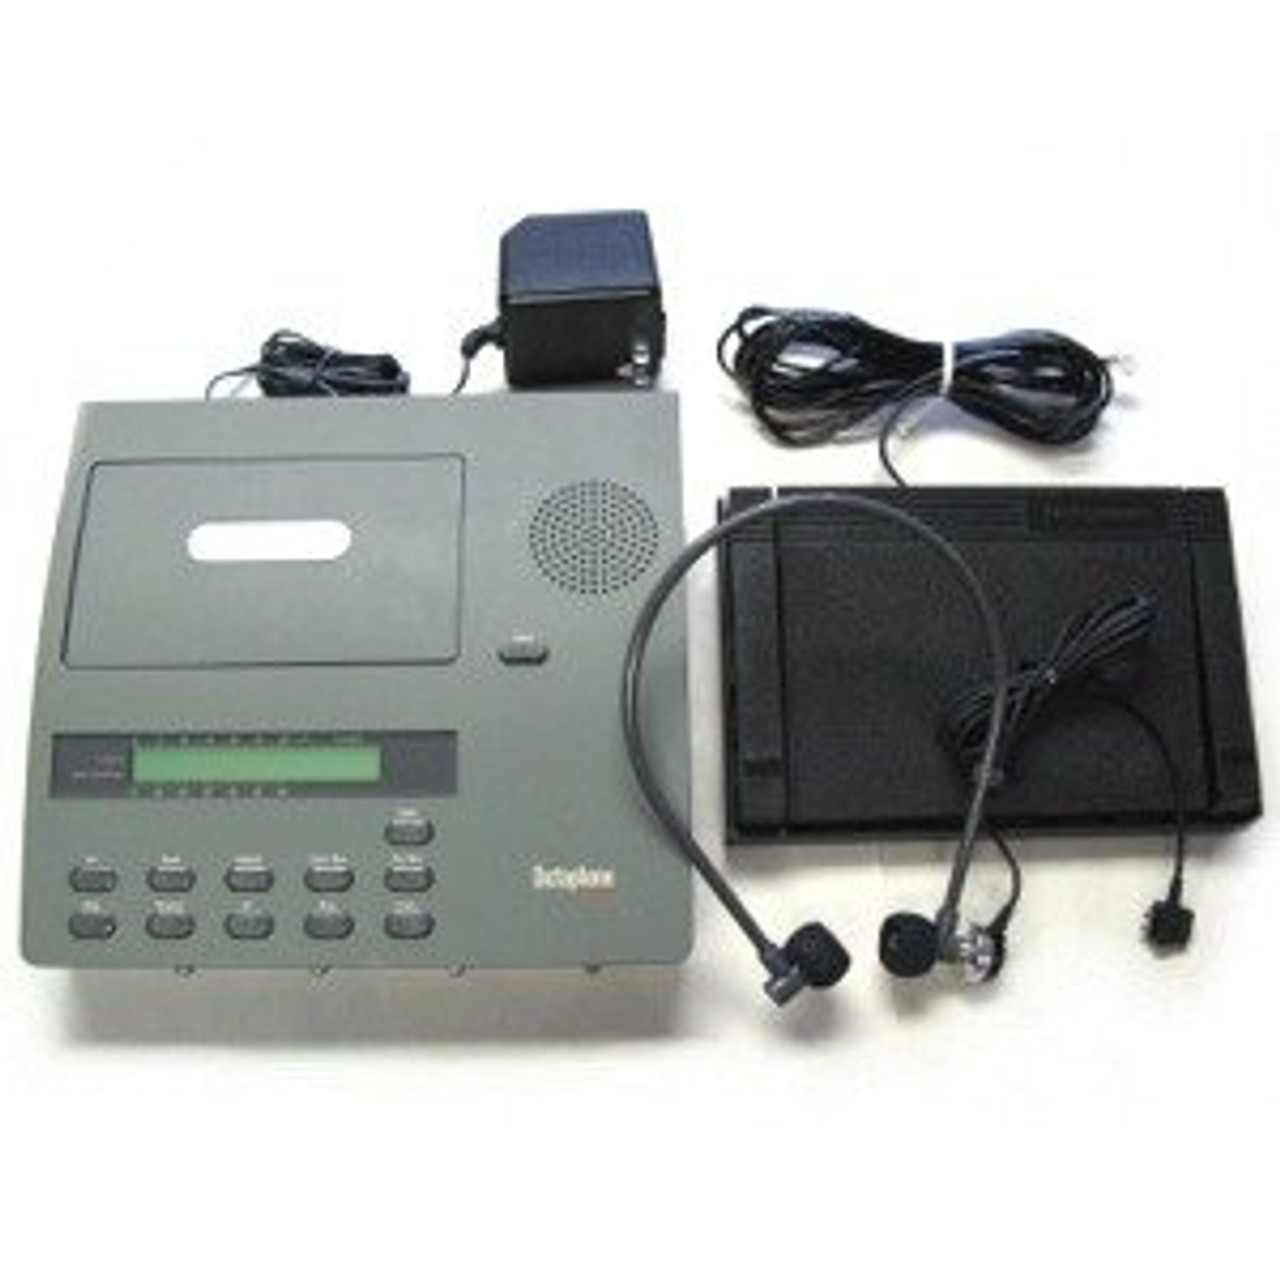 Dictaphone 2750 Standard Cassette ExpressWriter